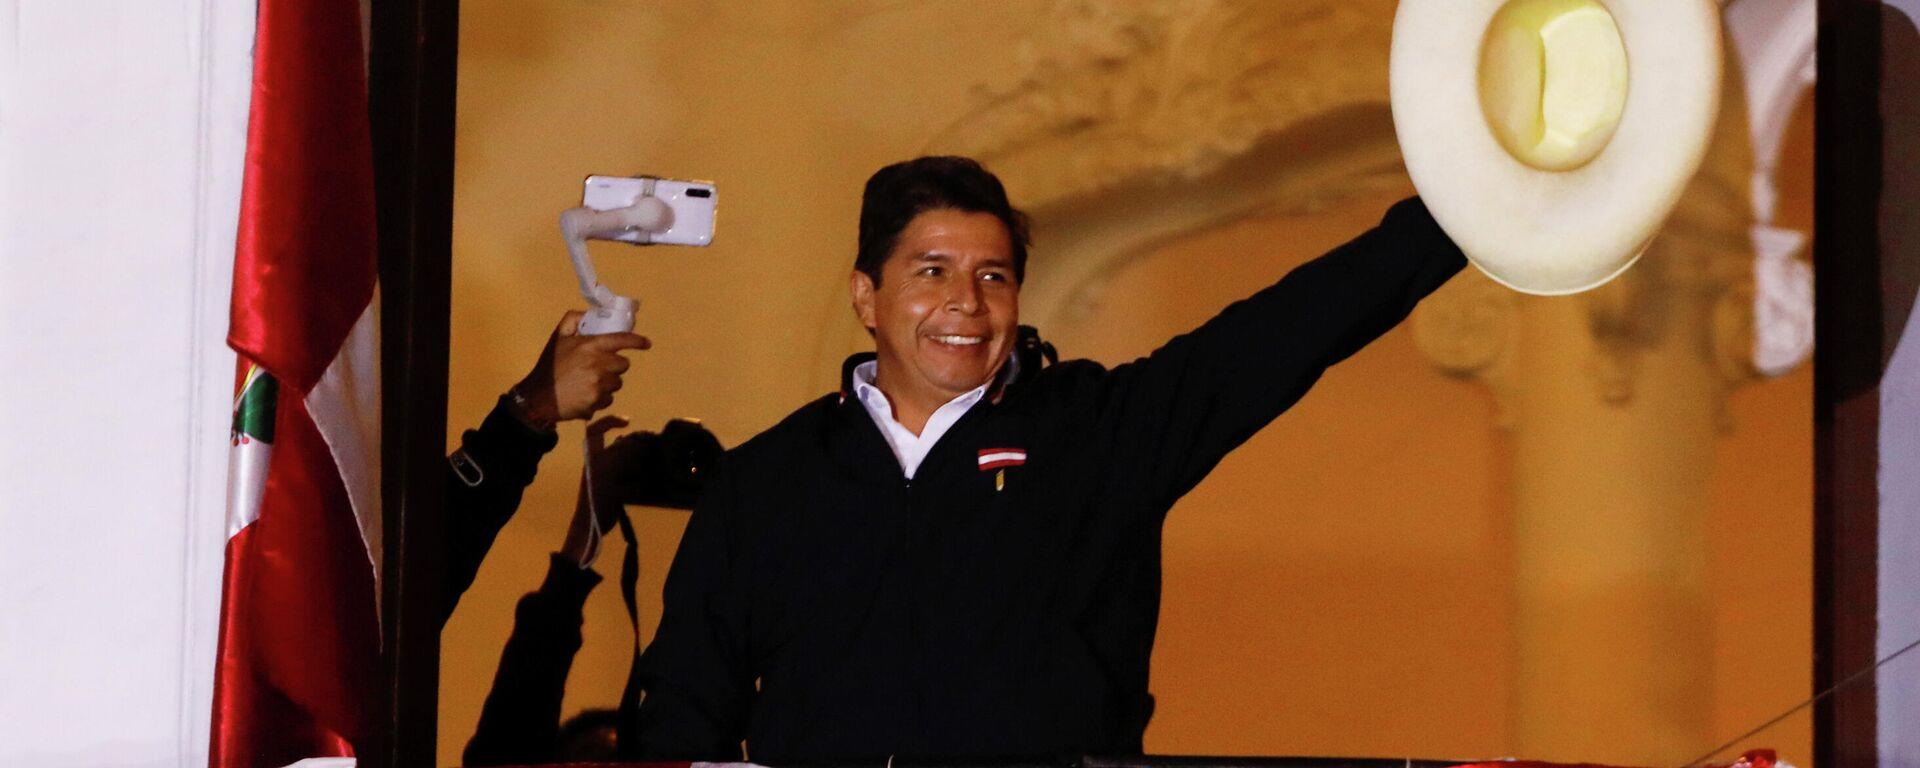 Pedro Castillo, candidato a la presidencia de Perú - Sputnik Mundo, 1920, 15.06.2021